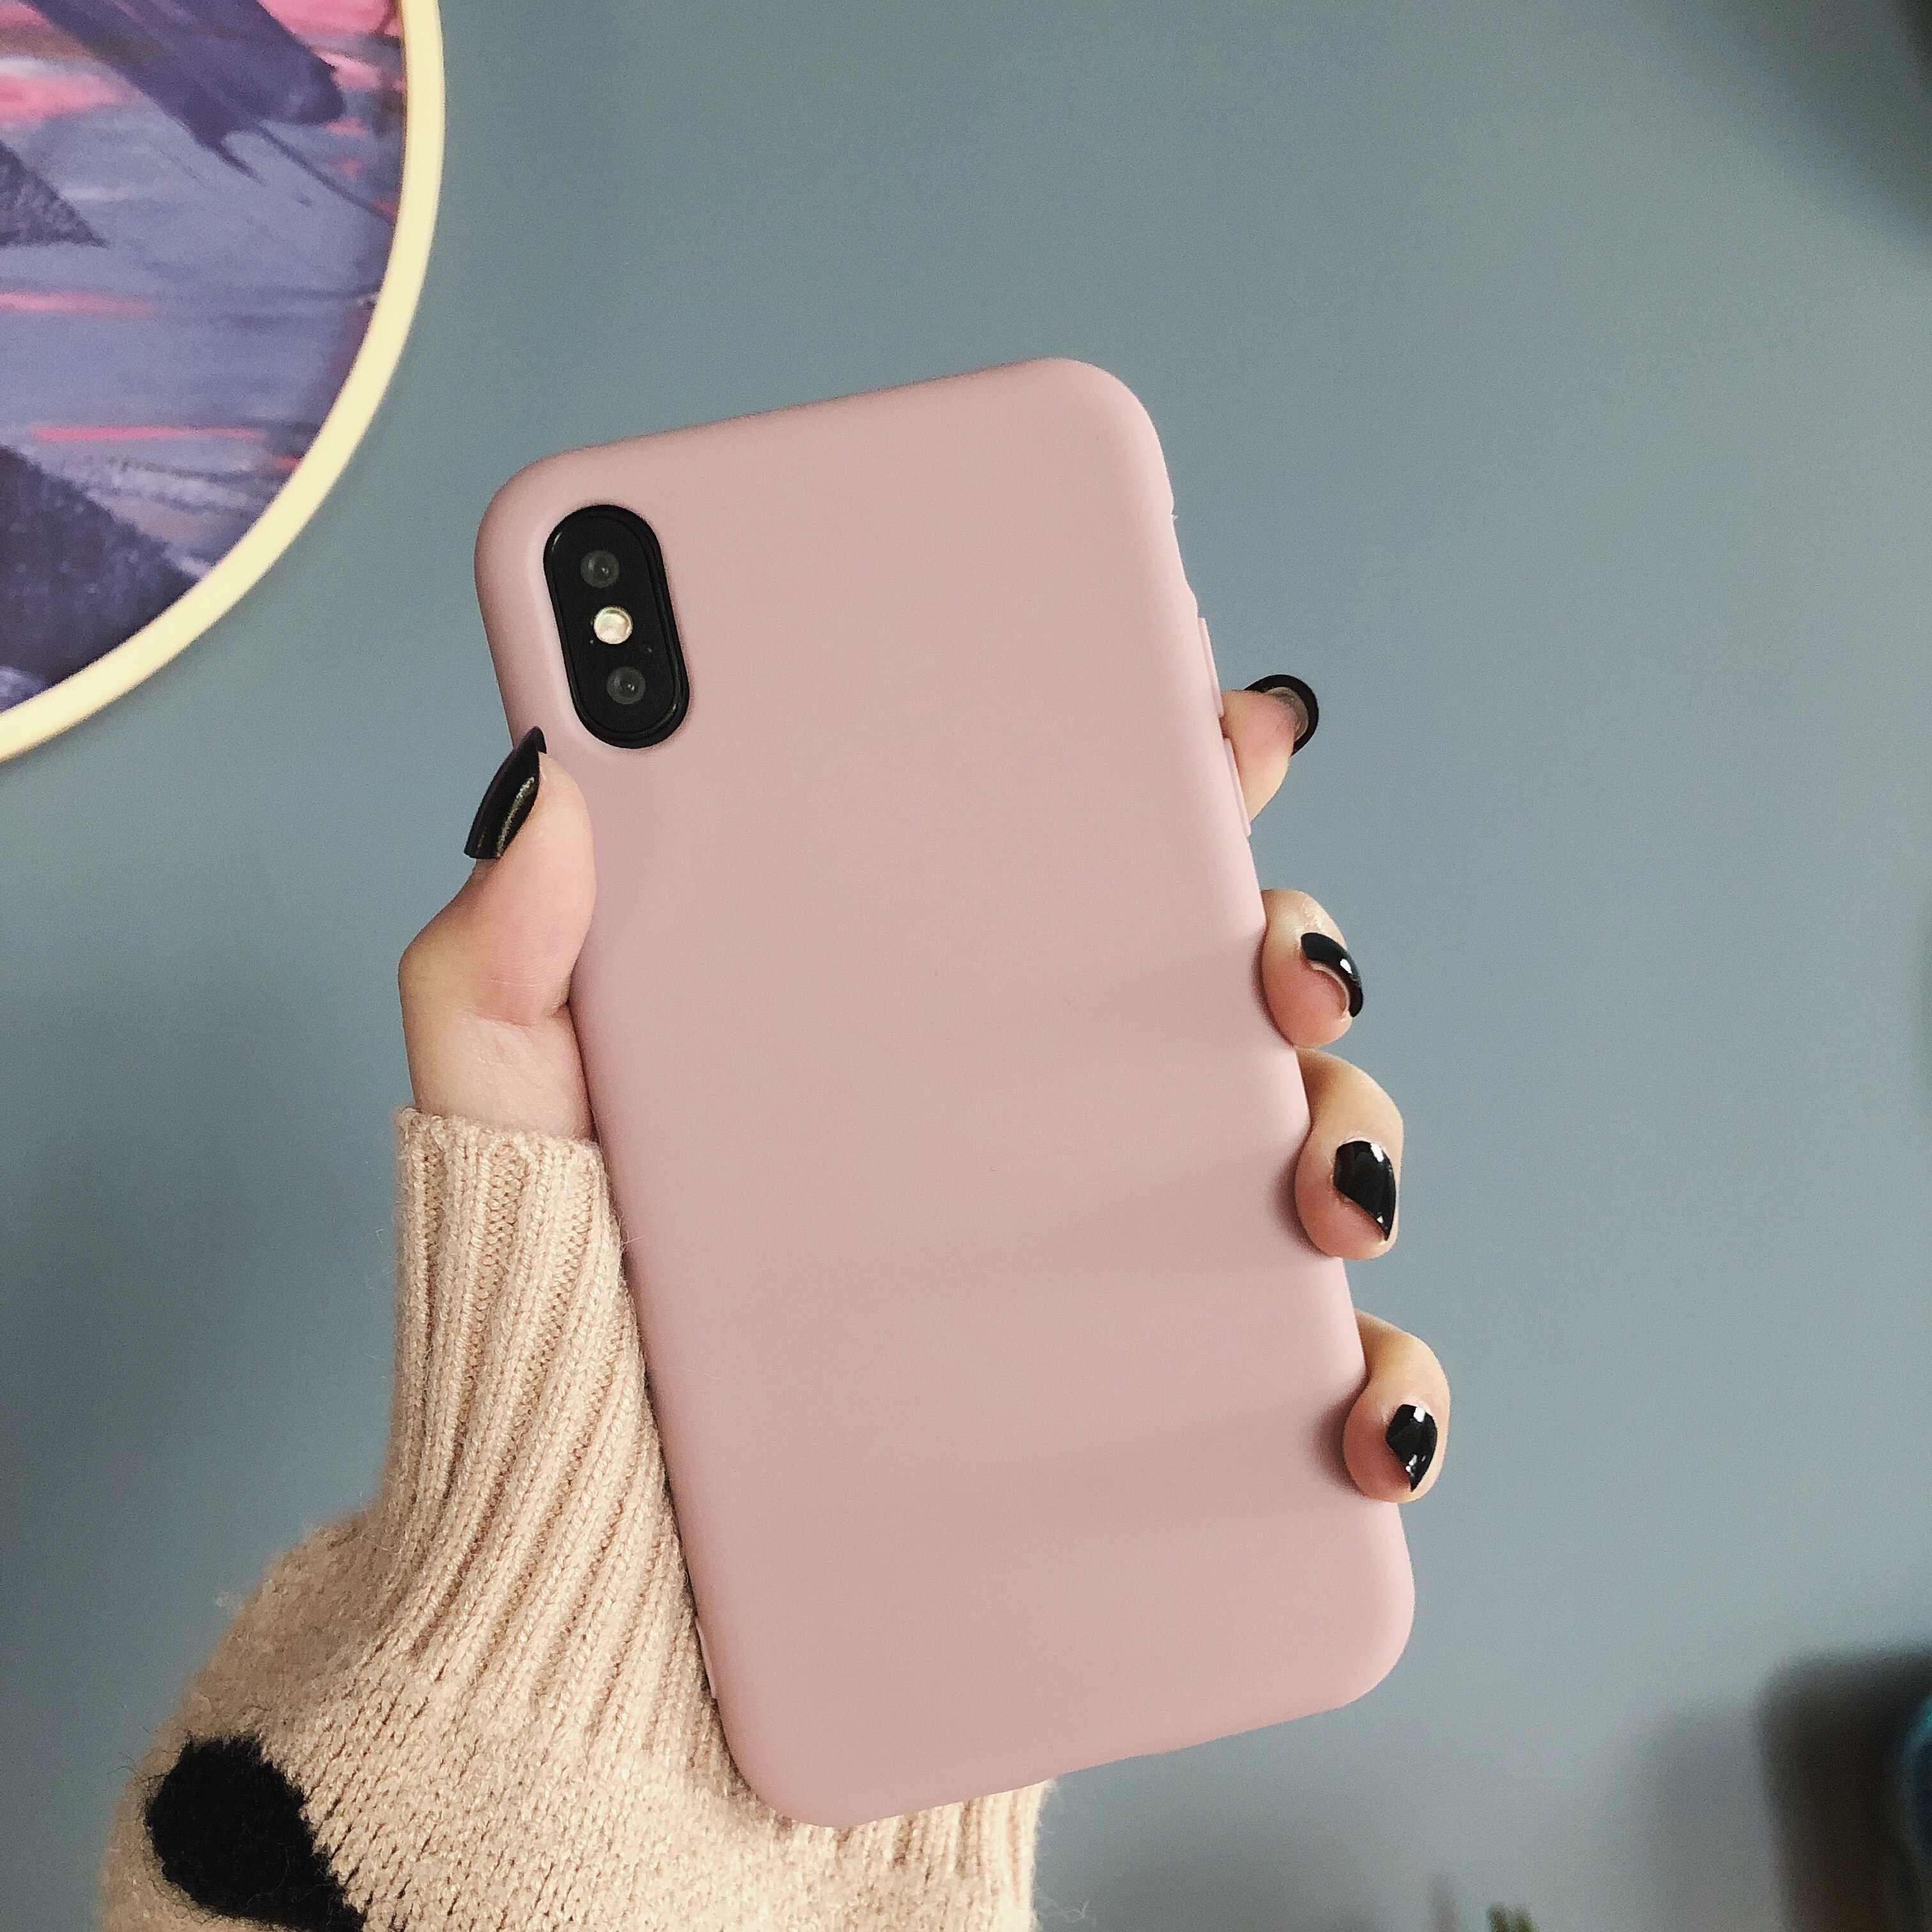 HYSOWENDLY סוכריות צבעים מקרה טלפון Redmi 6 הערה 7 רך TPU סיליקון מכסה נייד אביזרי לxiaomi 8 לייט 9SE לערבב 2 2s